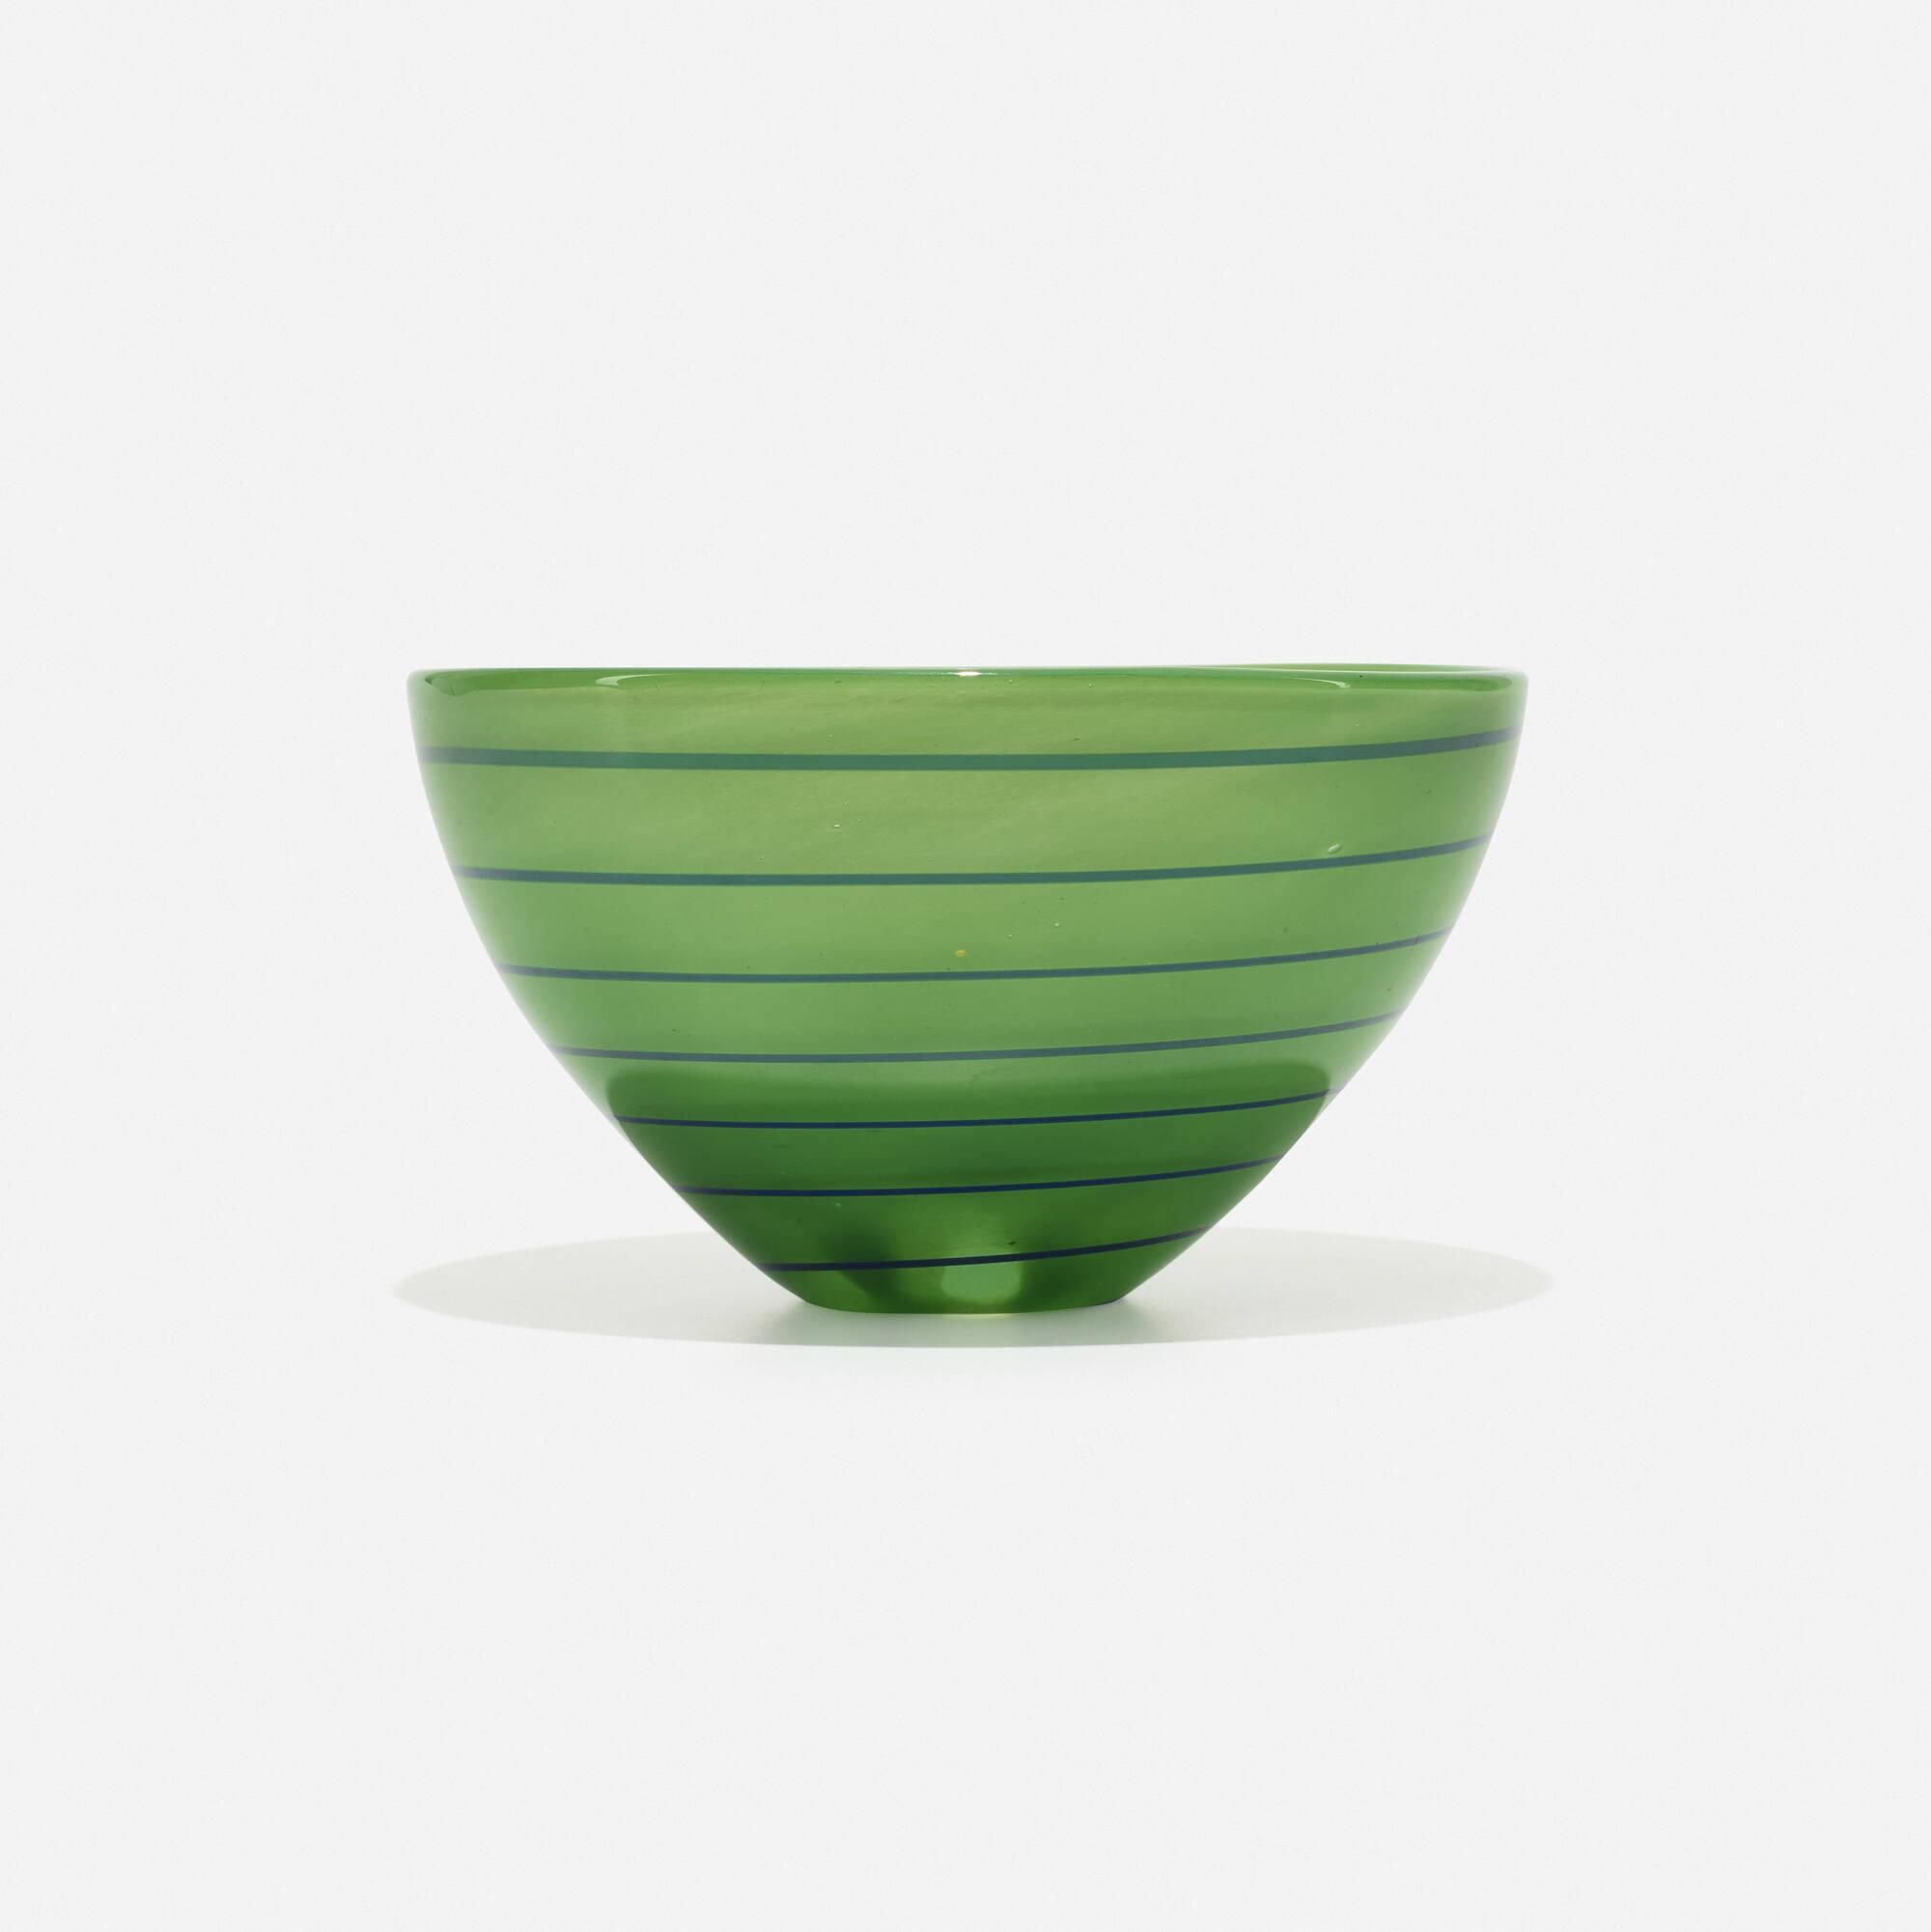 114: Anna Ehrner / bowl (1 of 3)